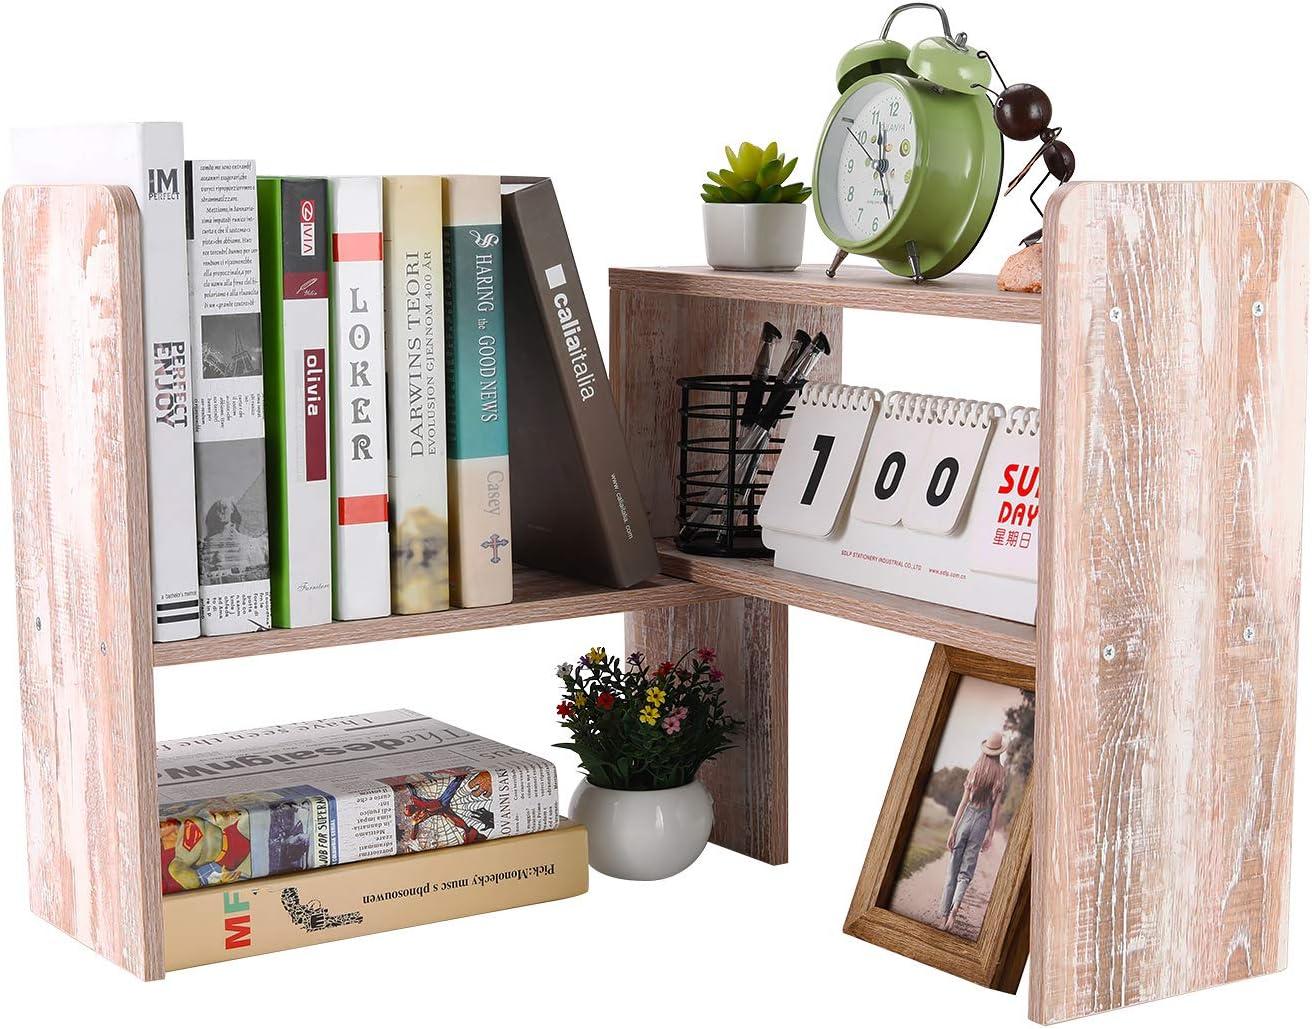 PAG Desktop Bookshelf Adjustable Countertop Bookcase Office Supplies Wood Desk Organizer Accessories Display Rack, Retro White